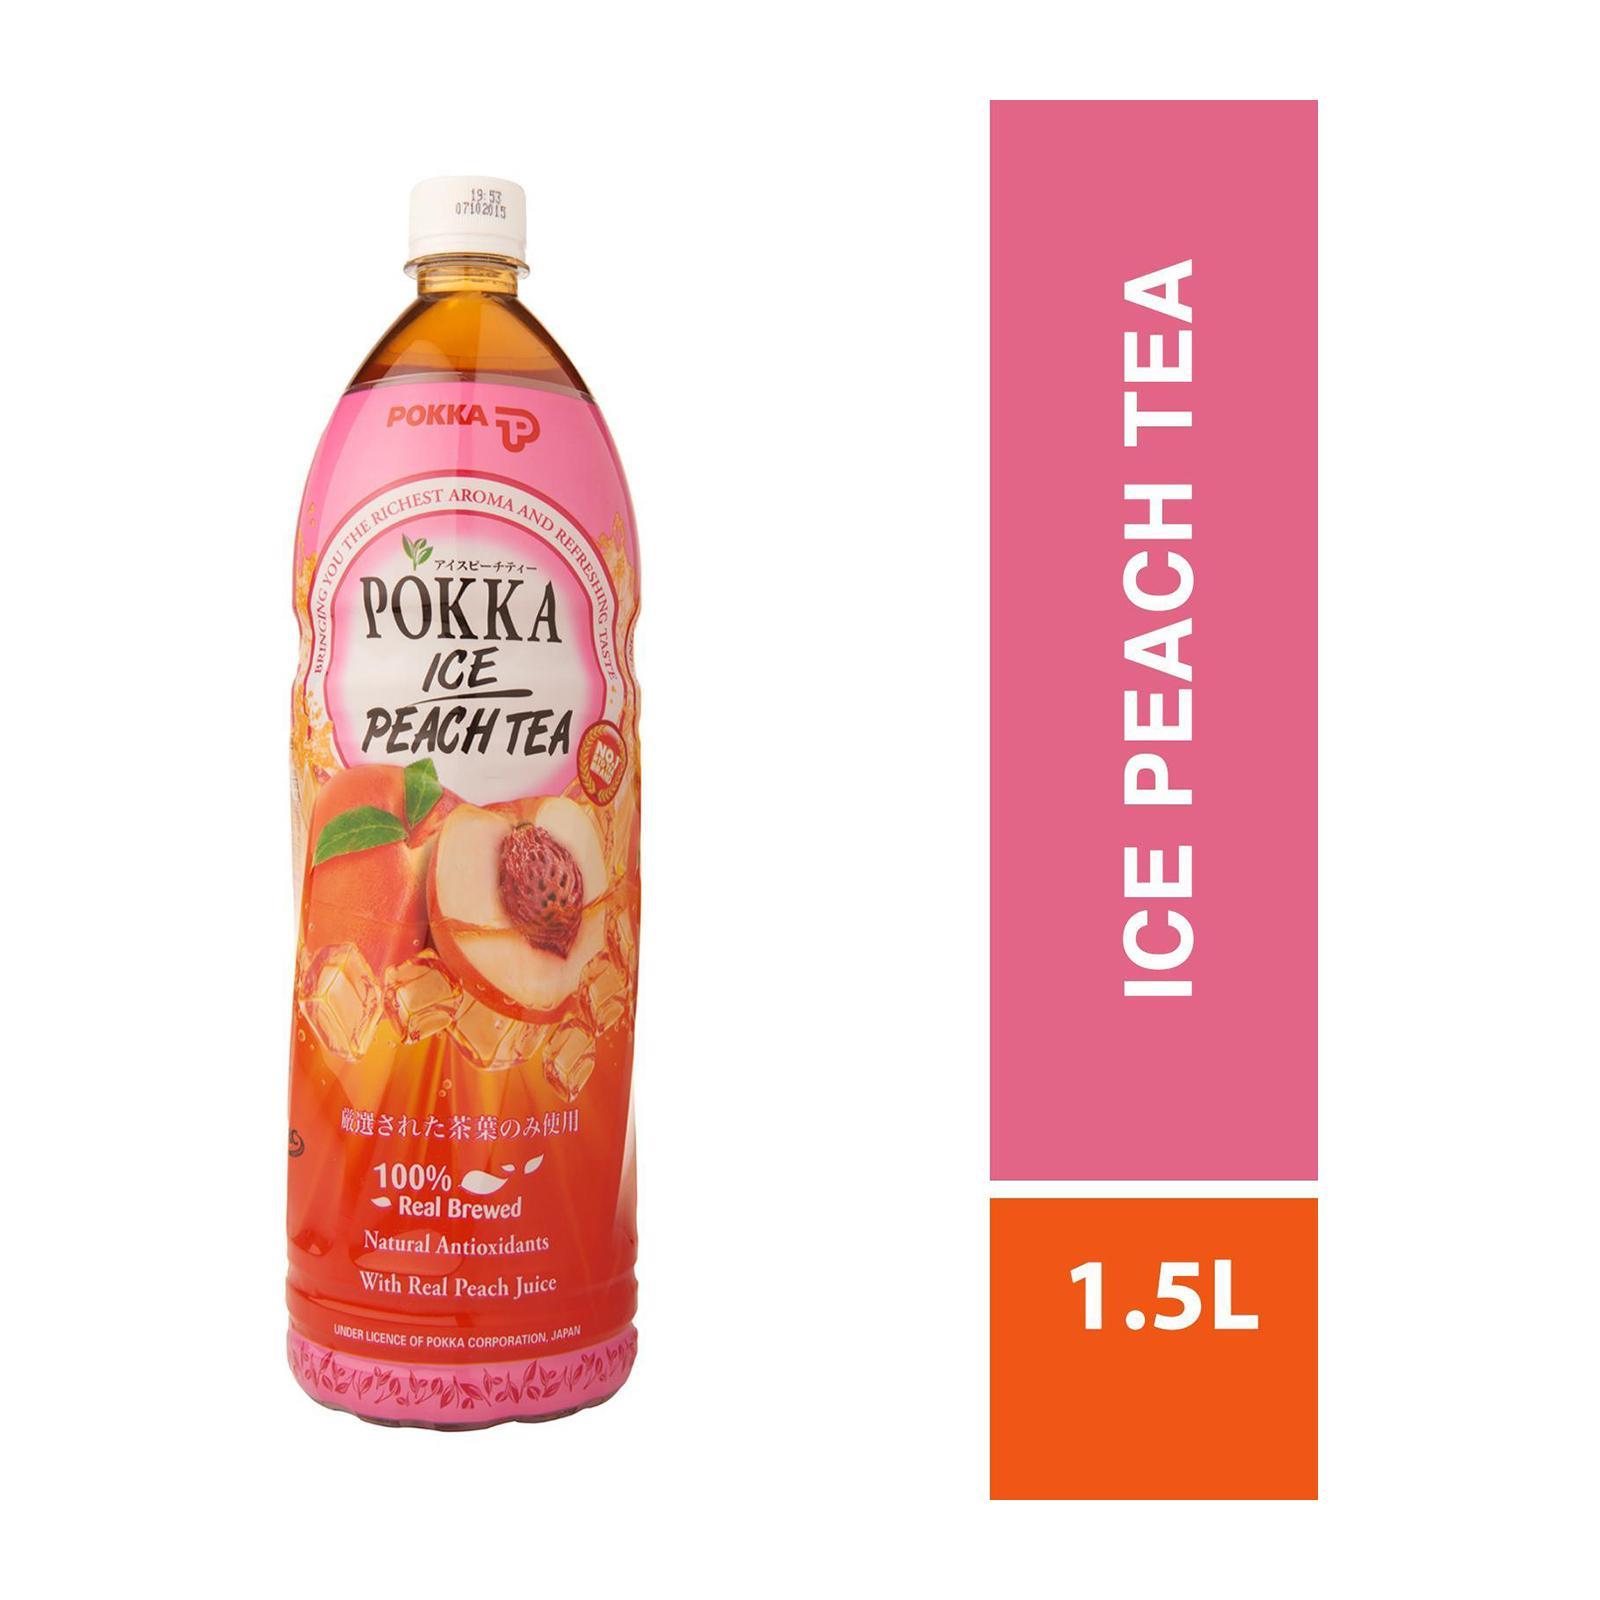 POKKA Ice Peach Tea 1.5L